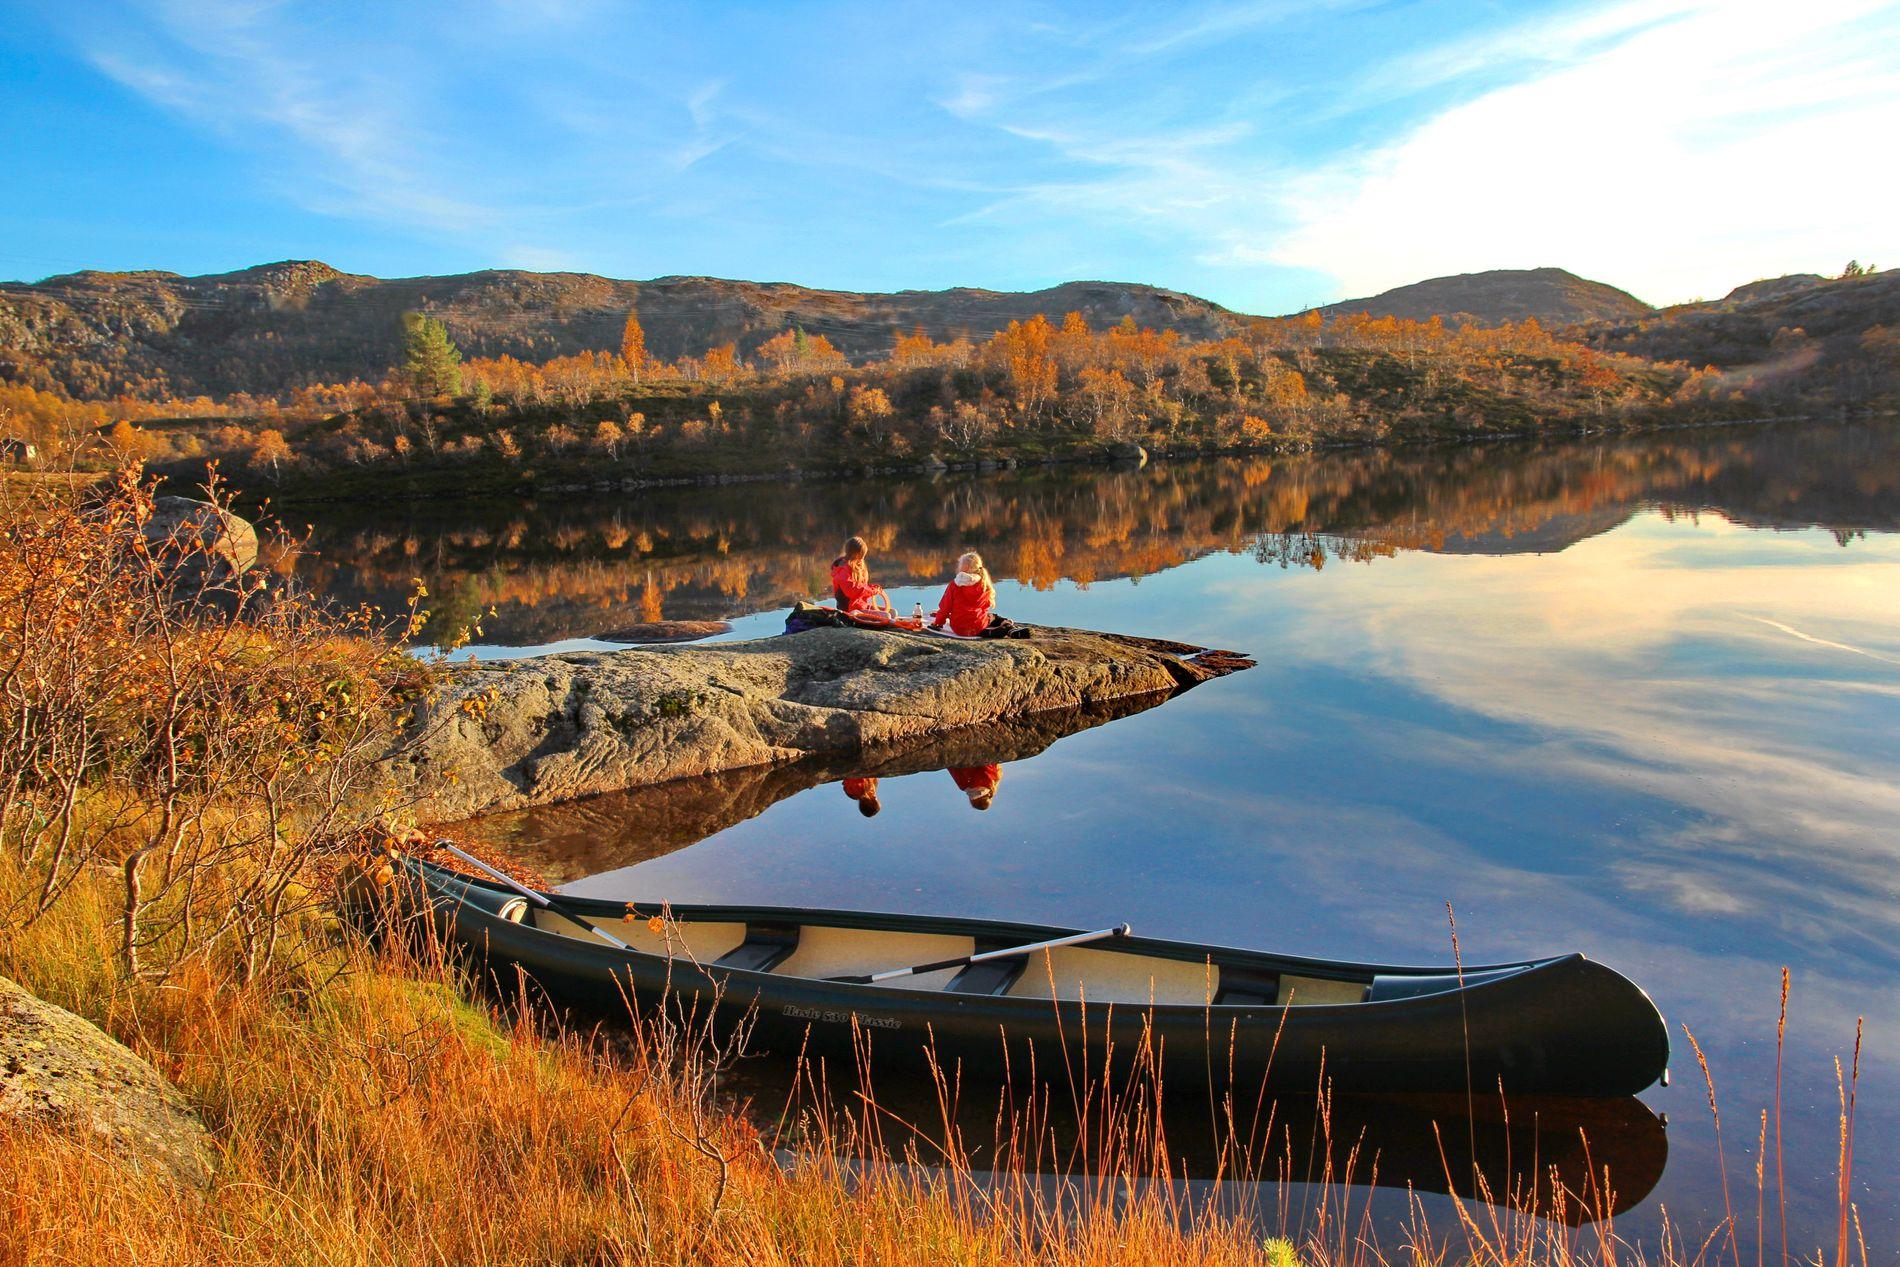 DRØMMEHØST? Slik kan det se ut på en klar, mild høstdag, motiv fra Sirdal nå i høst. Foto: DNT, Frank Haughom.